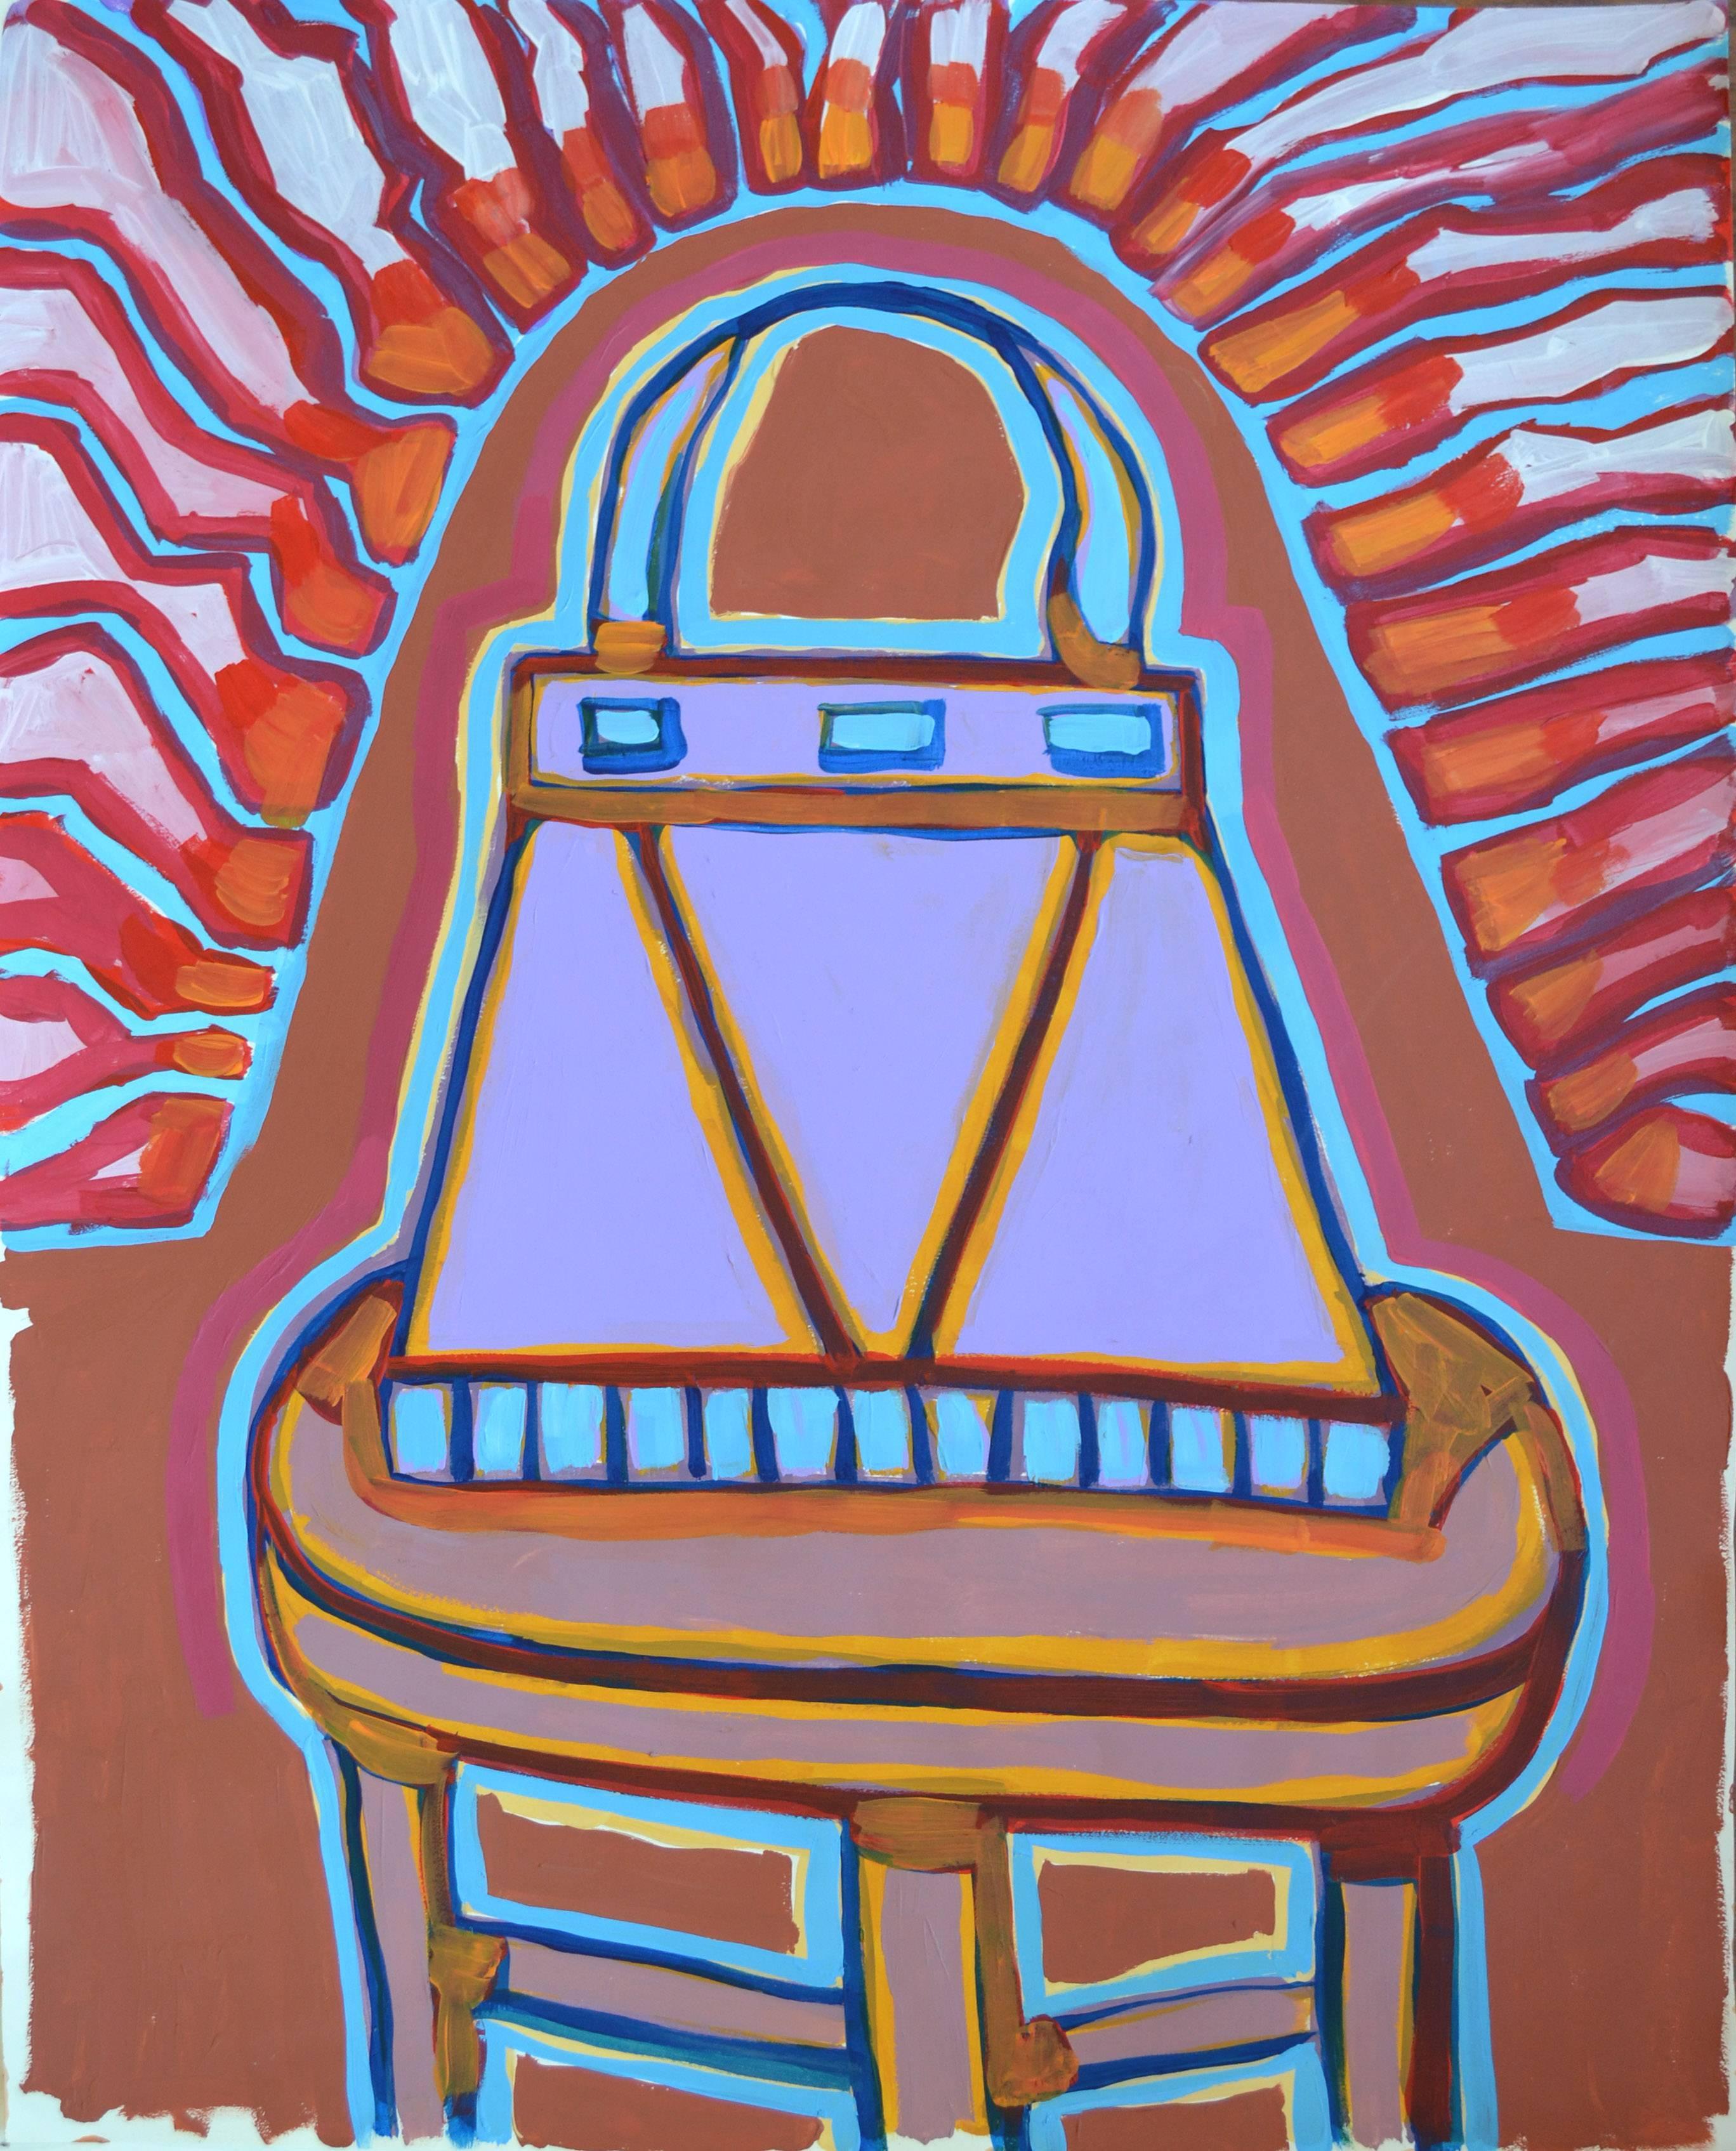 Electric Handbag Abstract